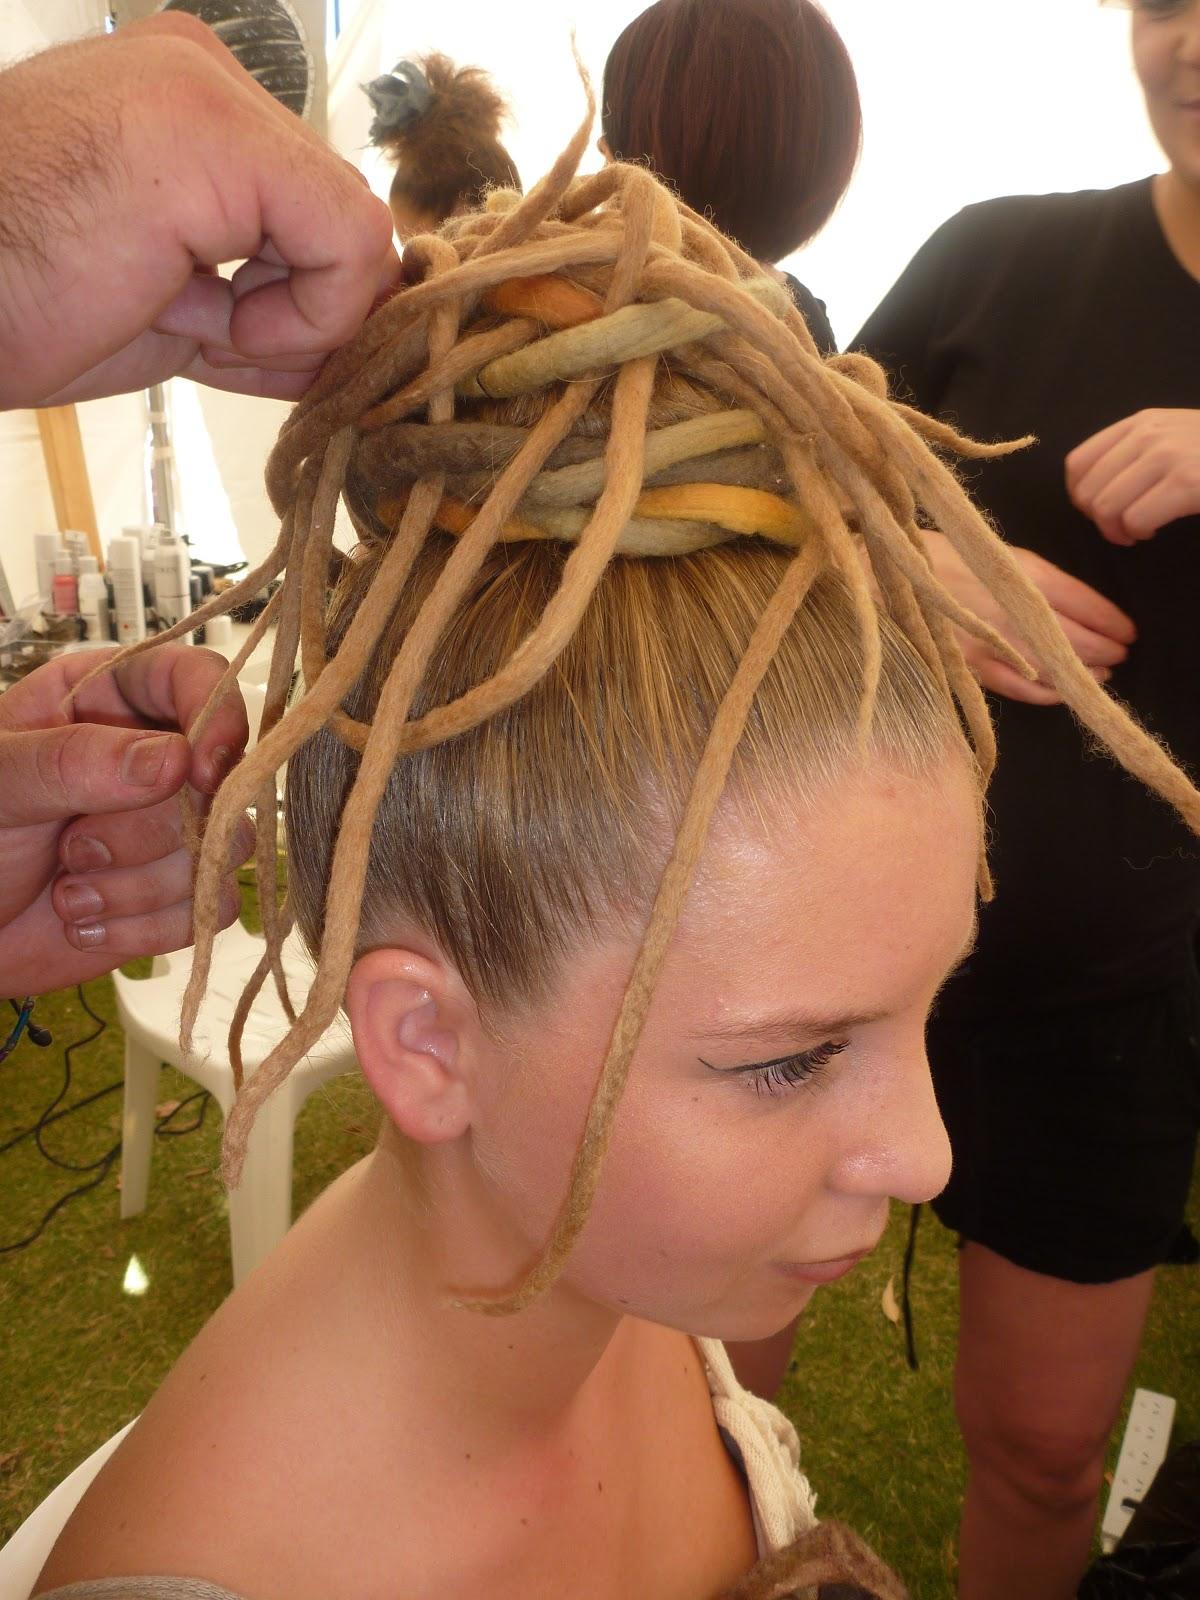 Superb 11Th Southern Hemisphere Felting Convergence 2011 South West Short Hairstyles Gunalazisus